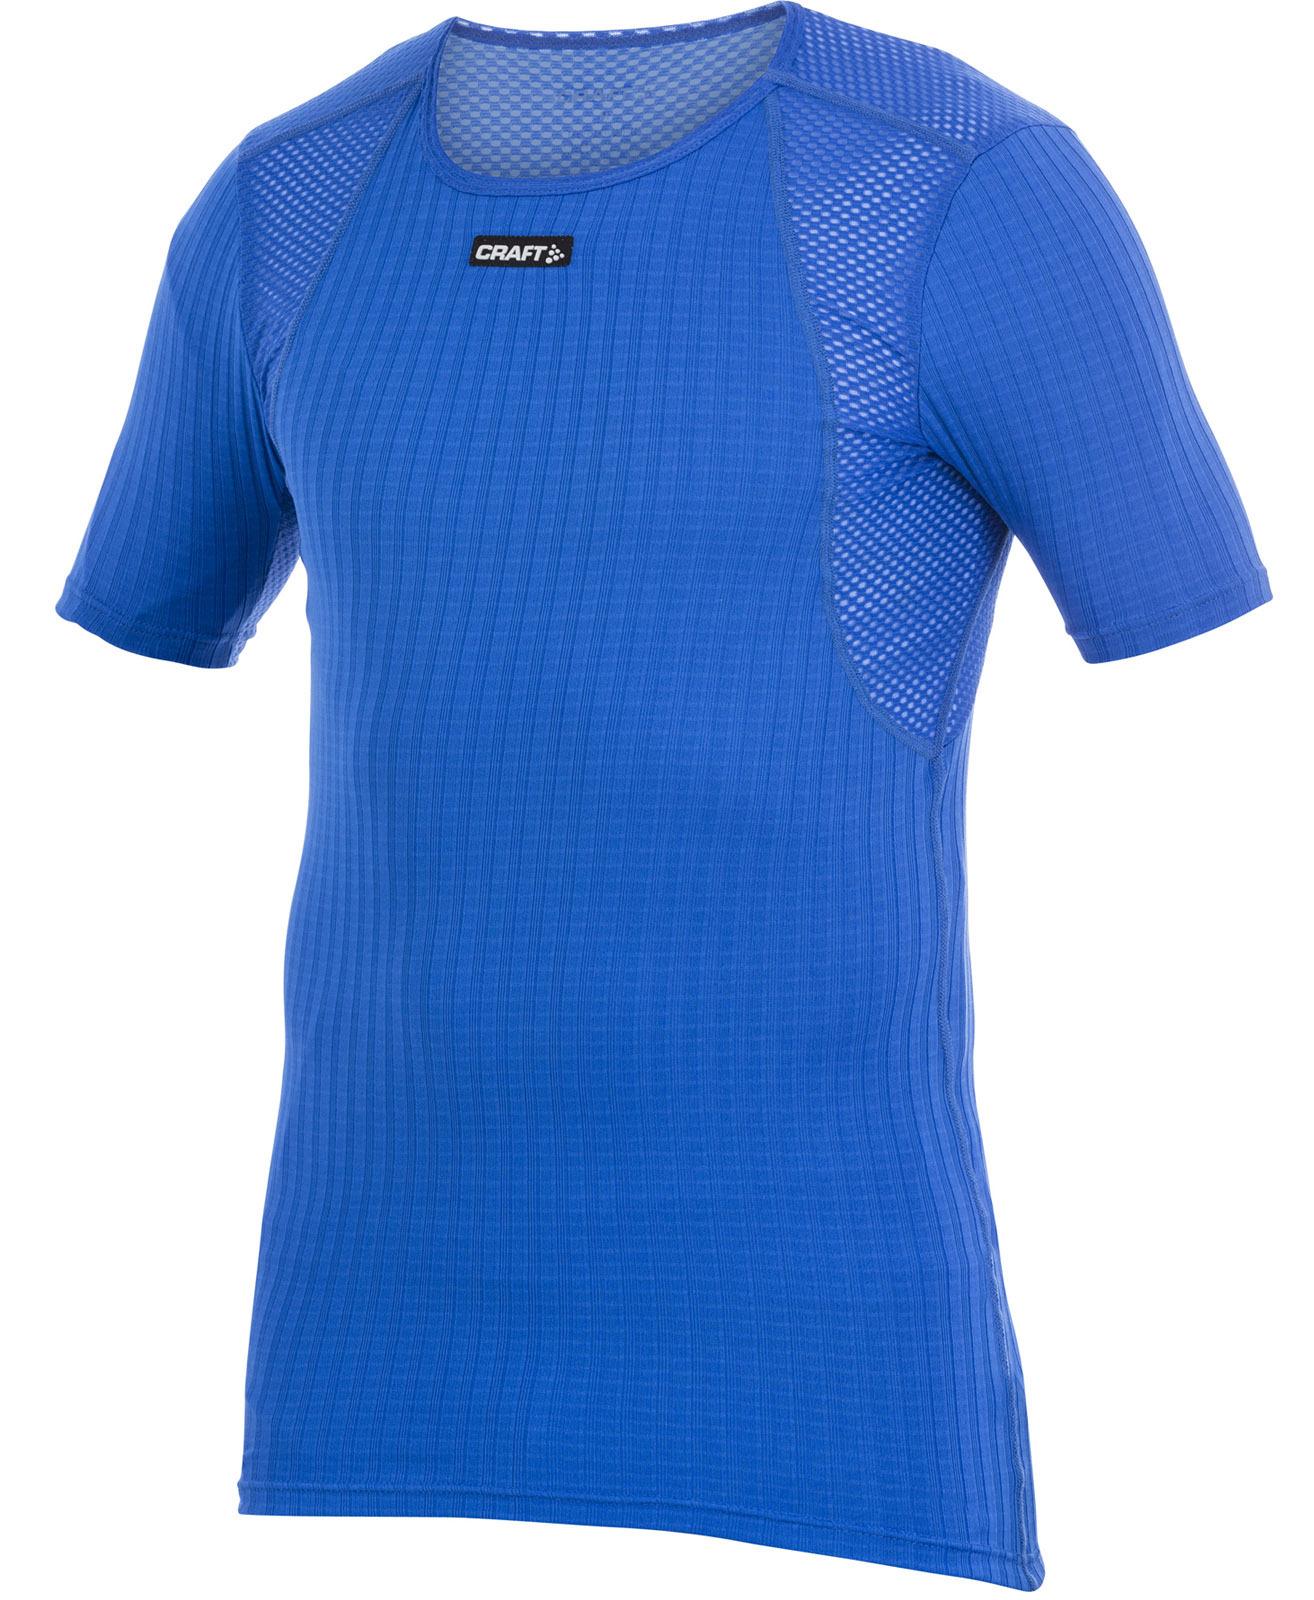 CRAFT ACTIVE EXTREME CONCEPT мужская футболка